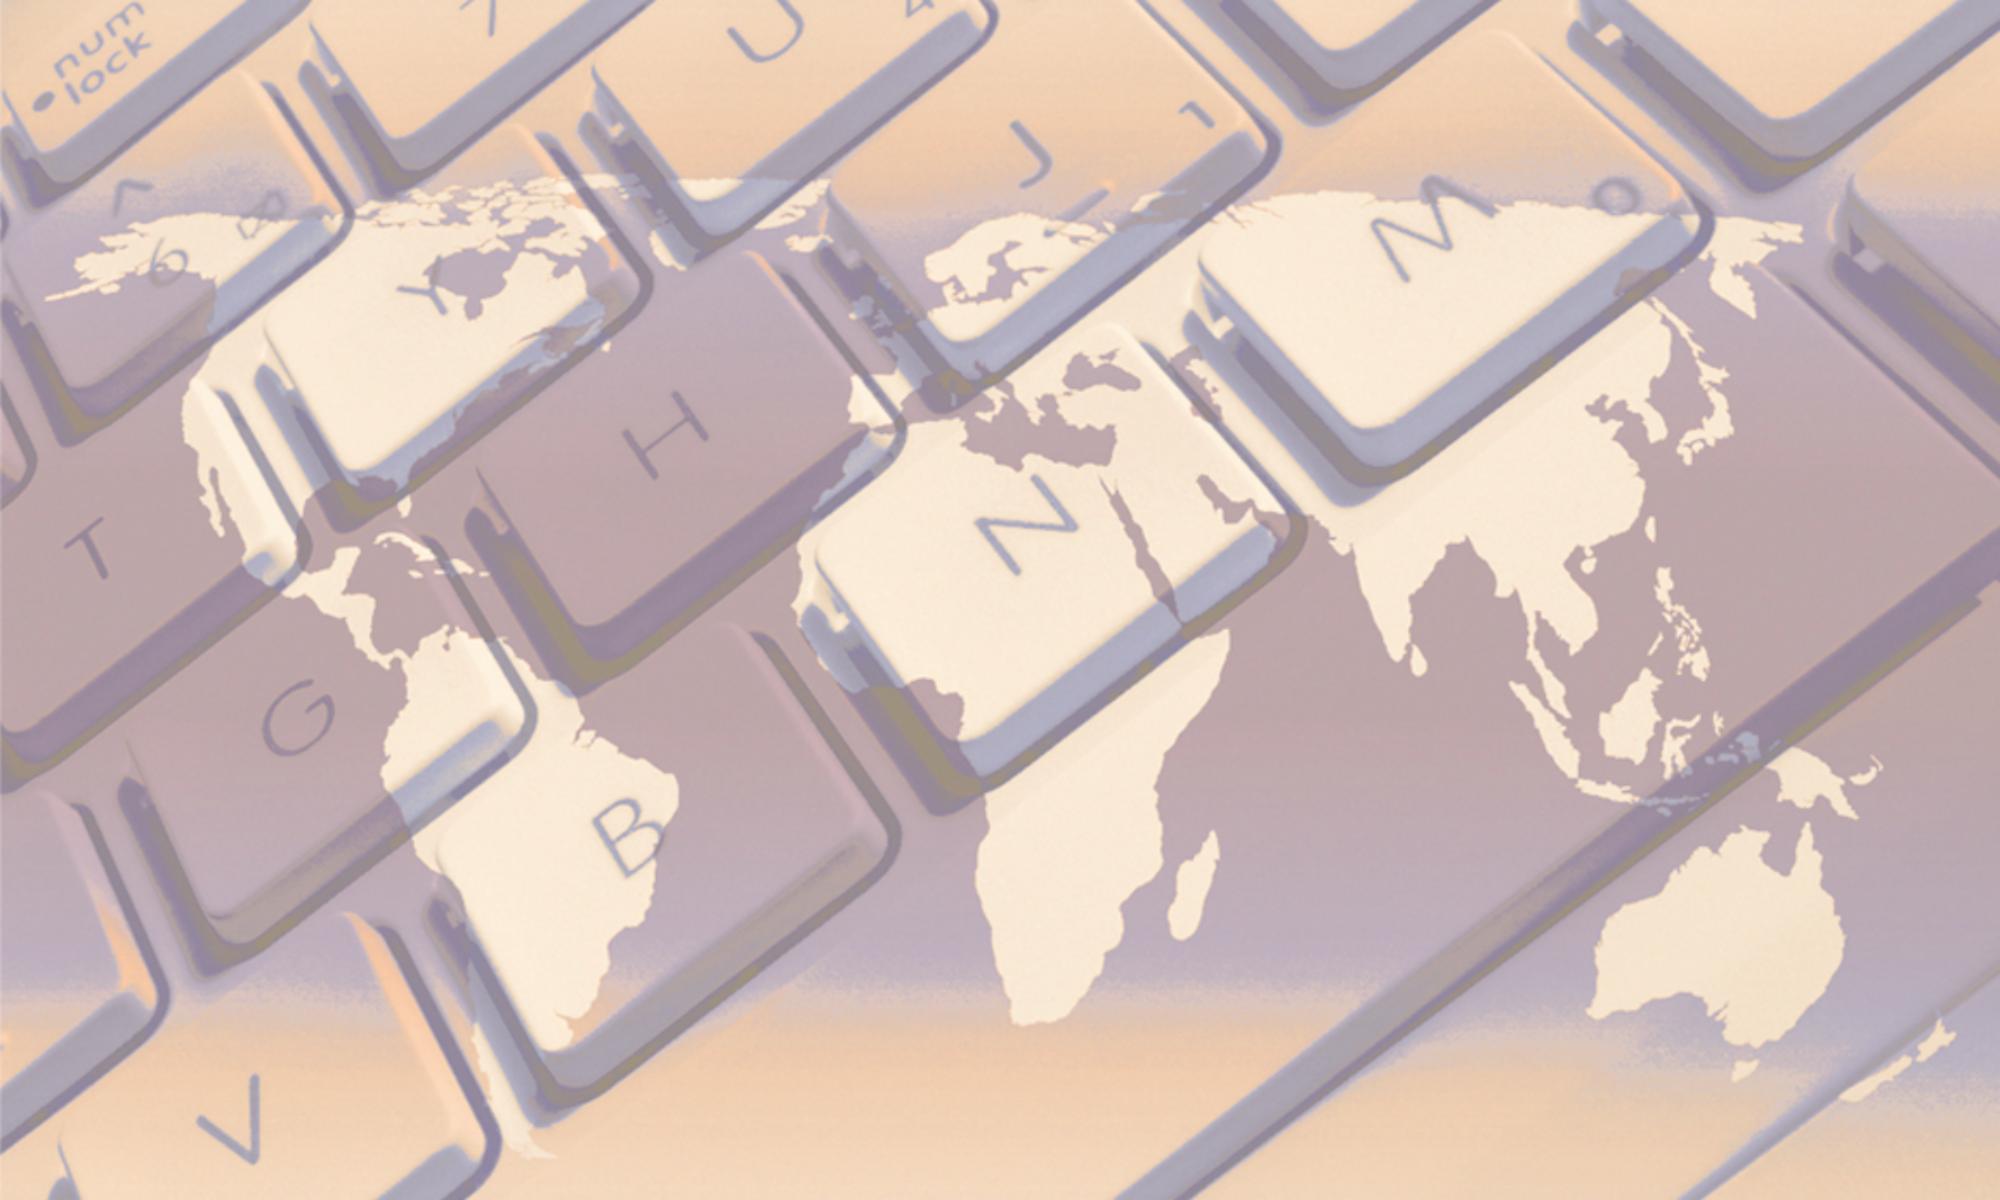 Best Typing tutors - KAZ reviews and blogs